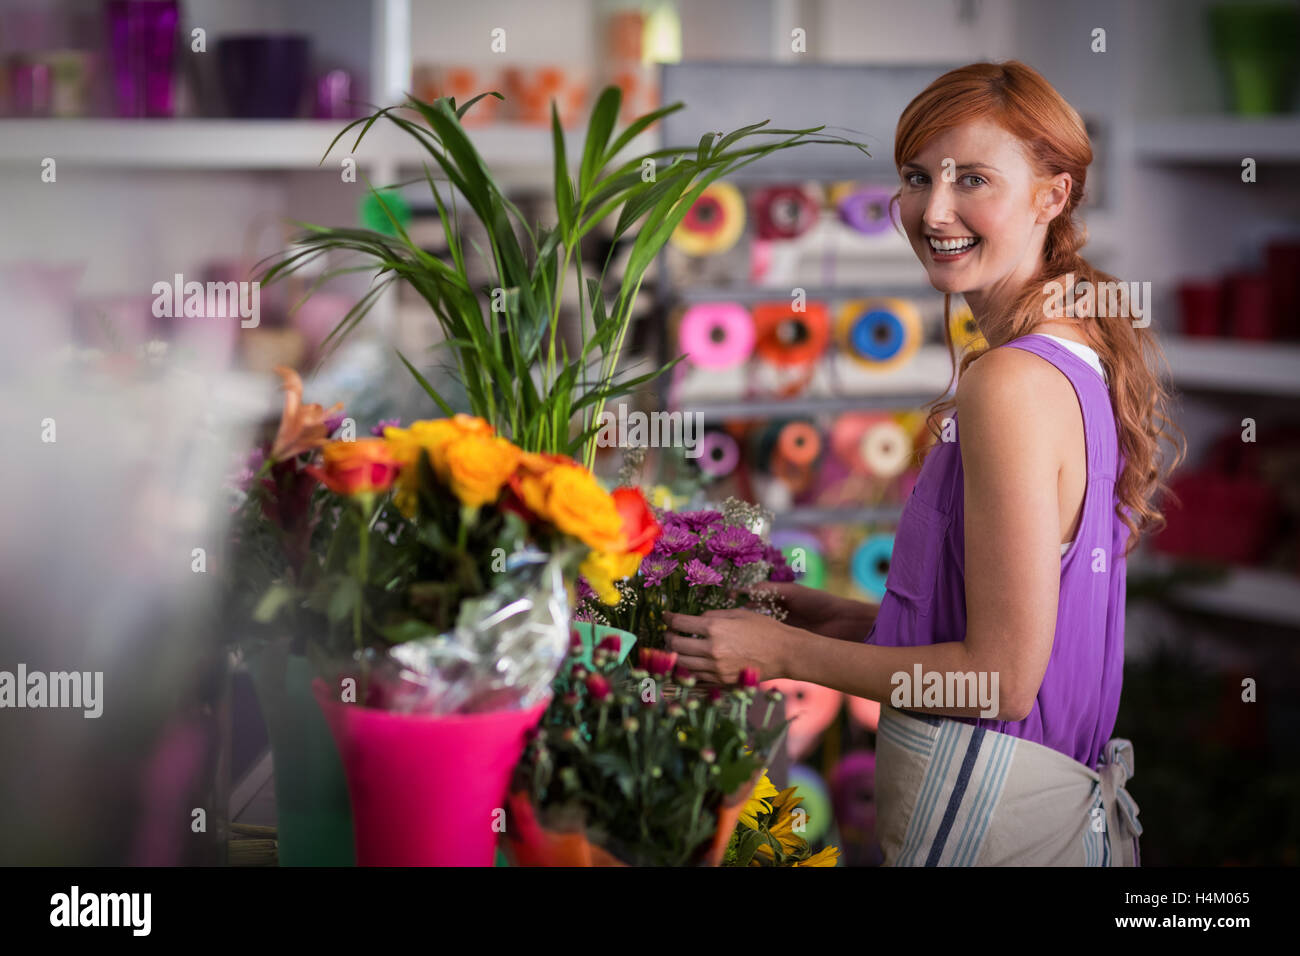 Female florist preparing flower bouquet - Stock Image